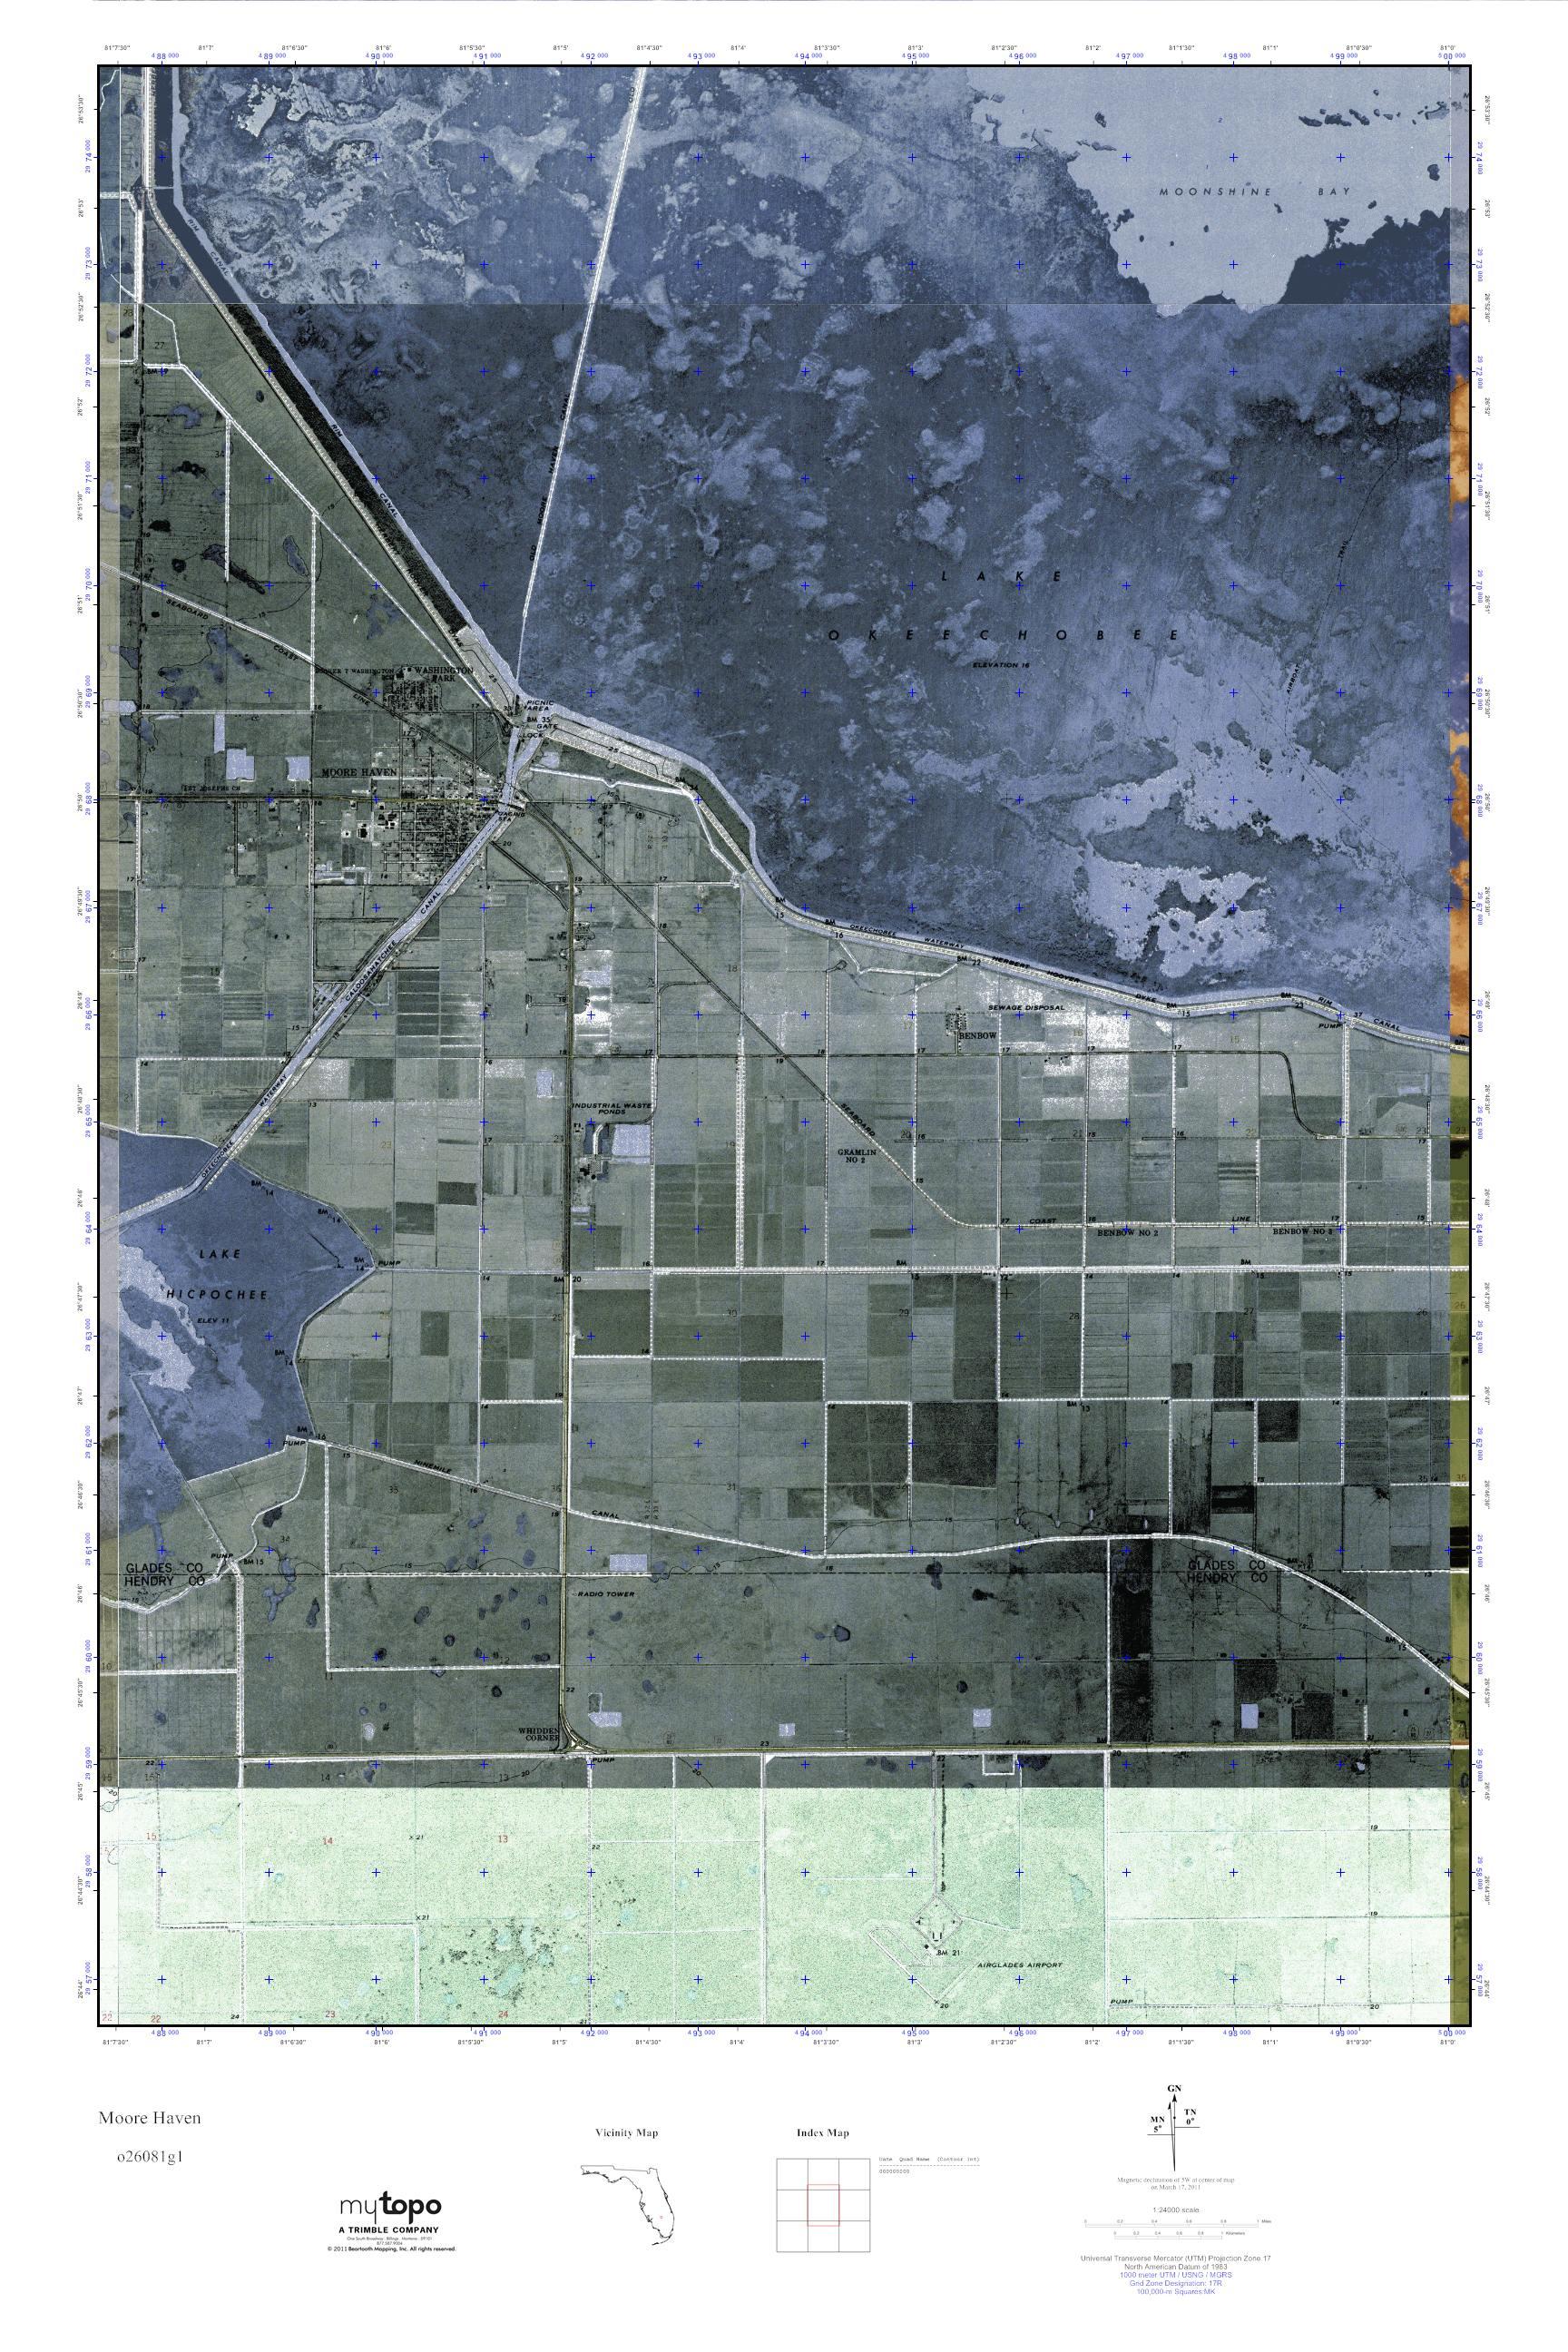 Moore Haven Florida Map.Mytopo Moore Haven Florida Usgs Quad Topo Map